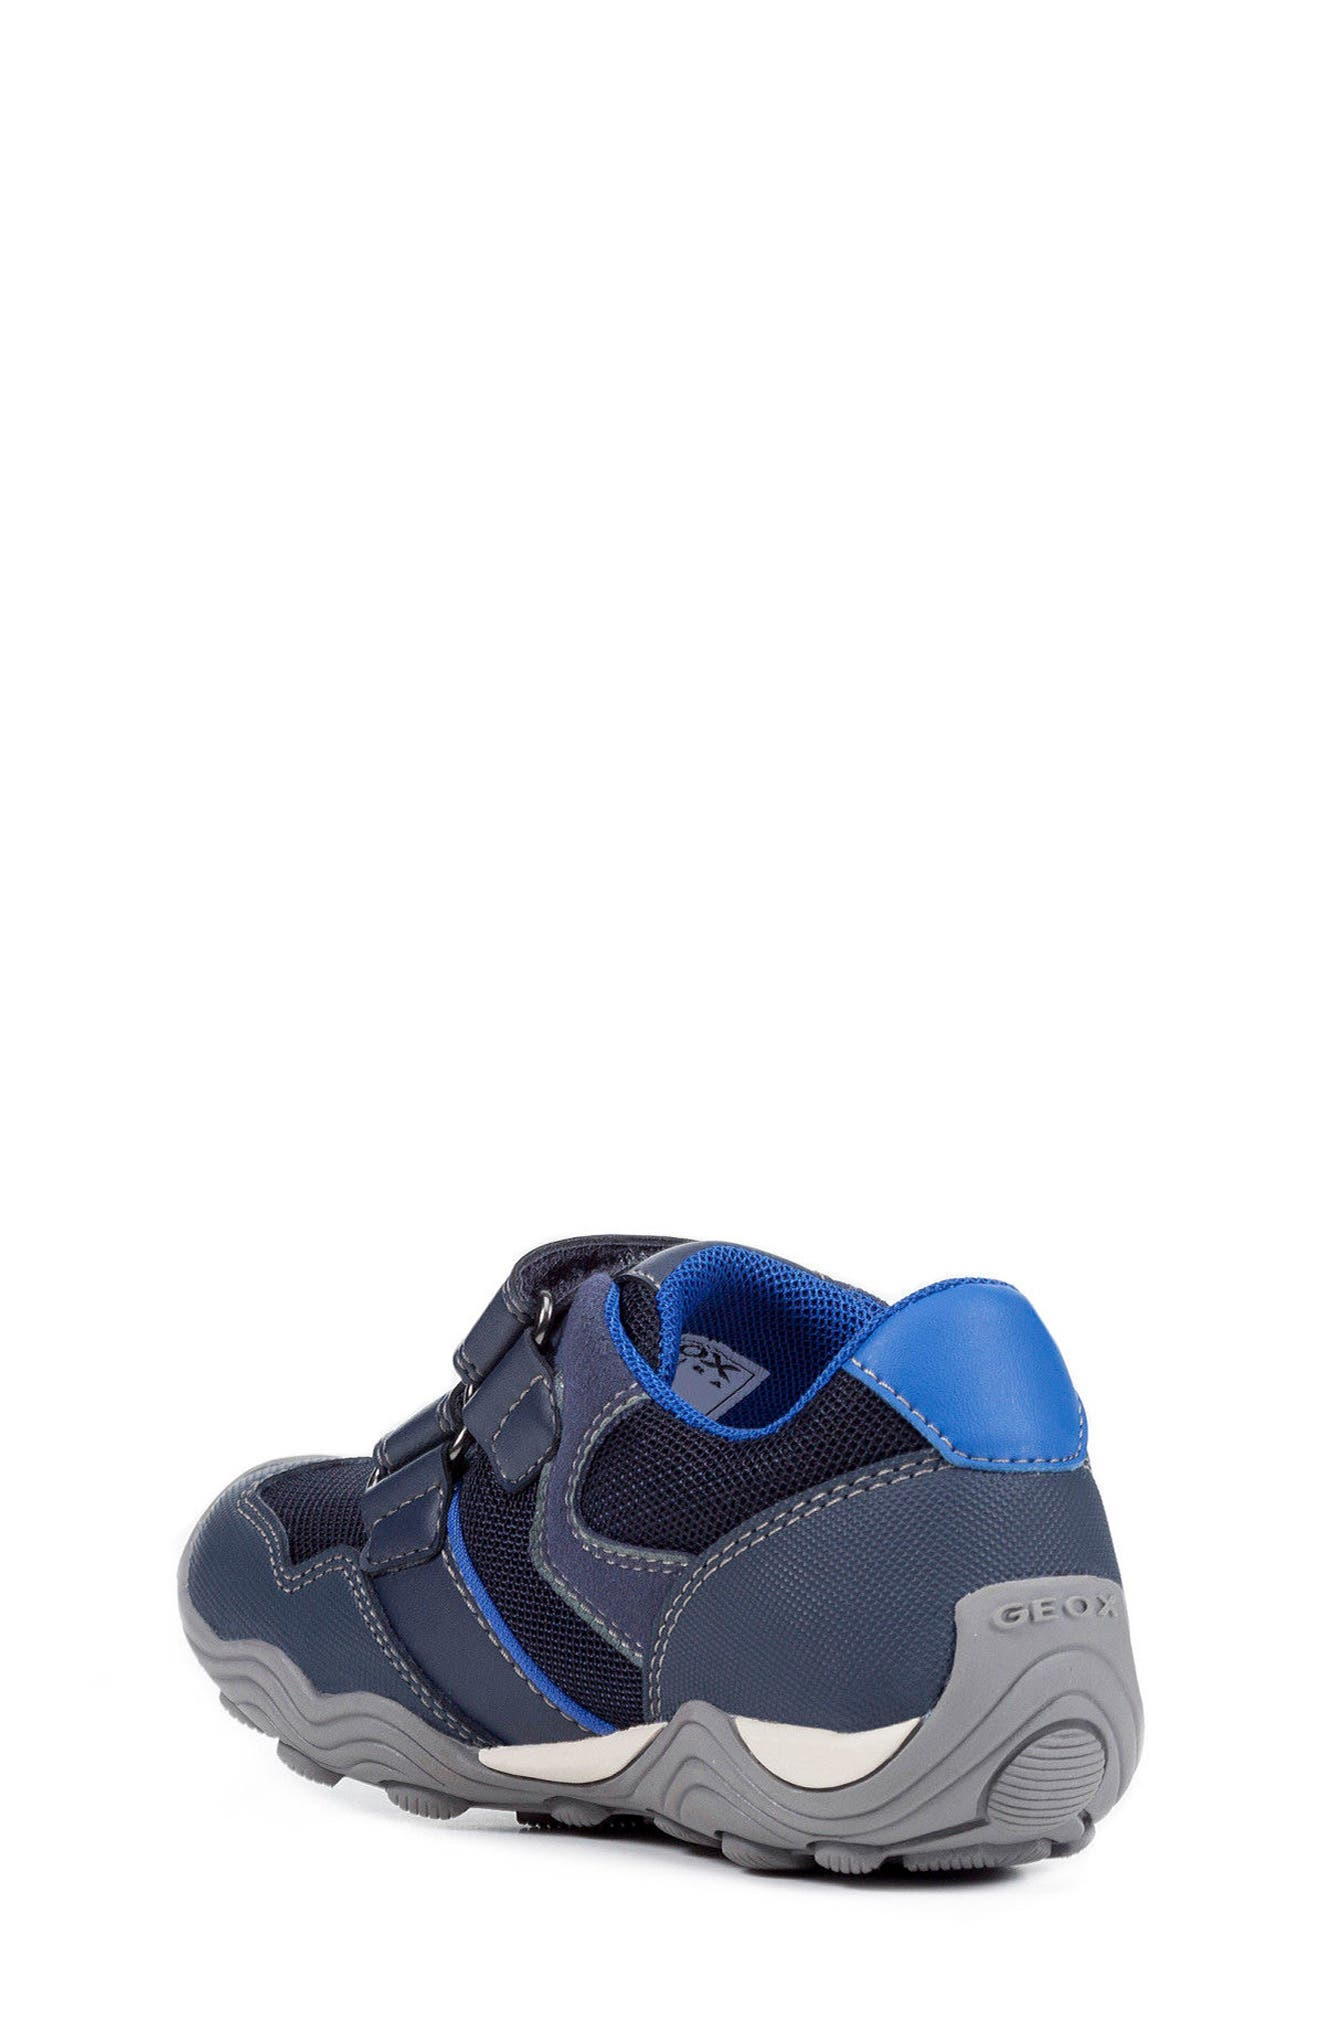 Jr Arno 13 Sneaker,                             Alternate thumbnail 2, color,                             Navy/ Royal Blue